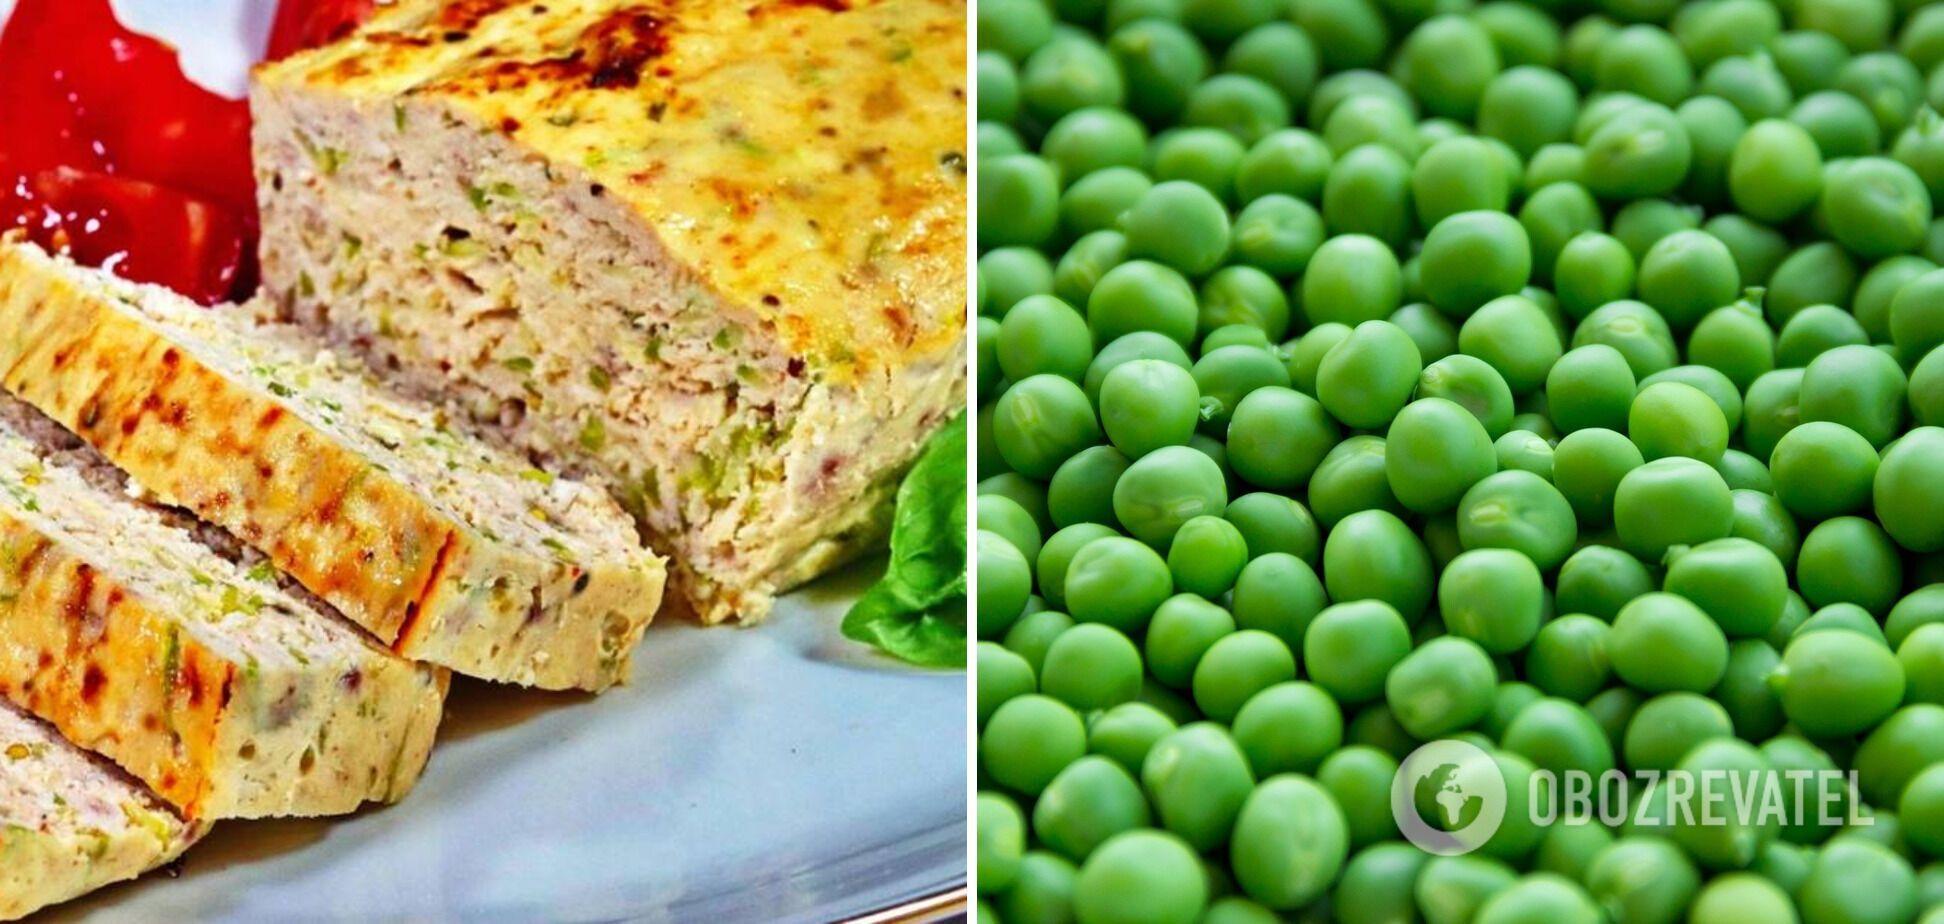 В блюдо можно добавлять горох, оливки